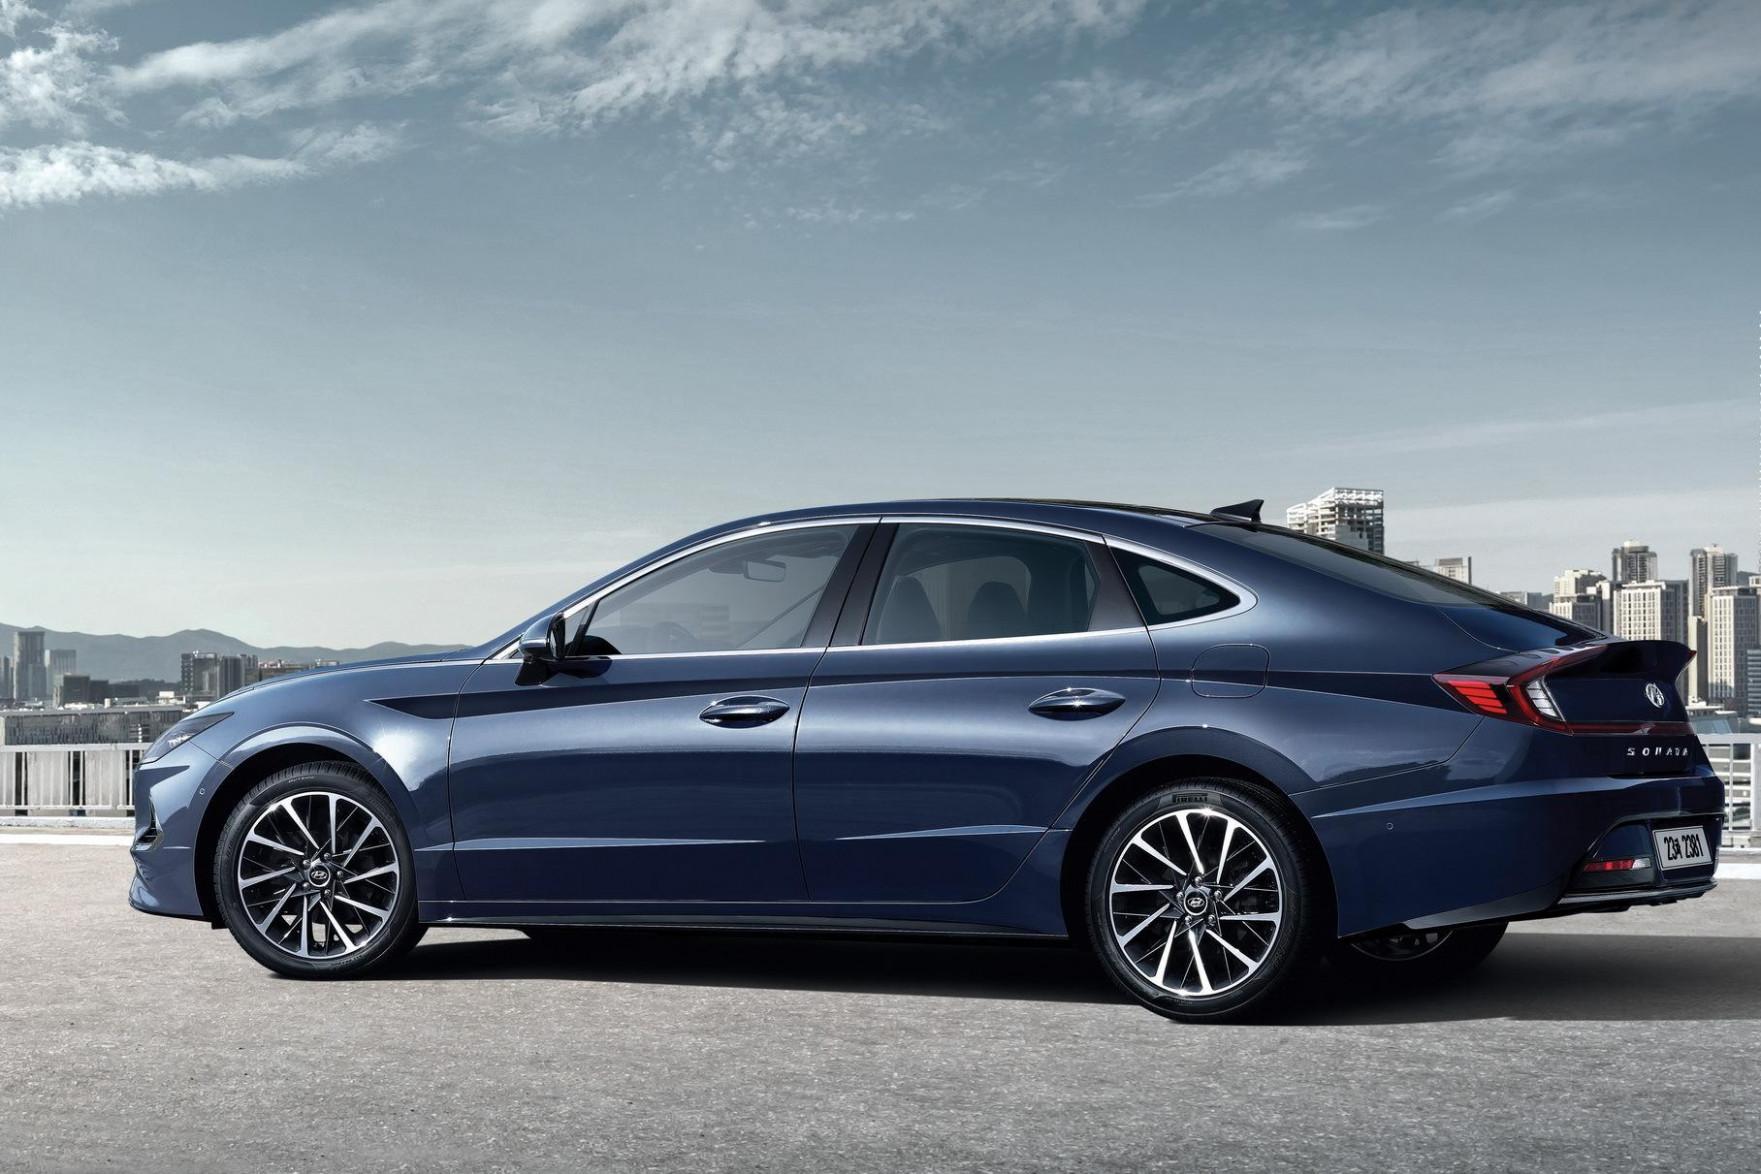 Exterior 2022 Hyundai Sonata